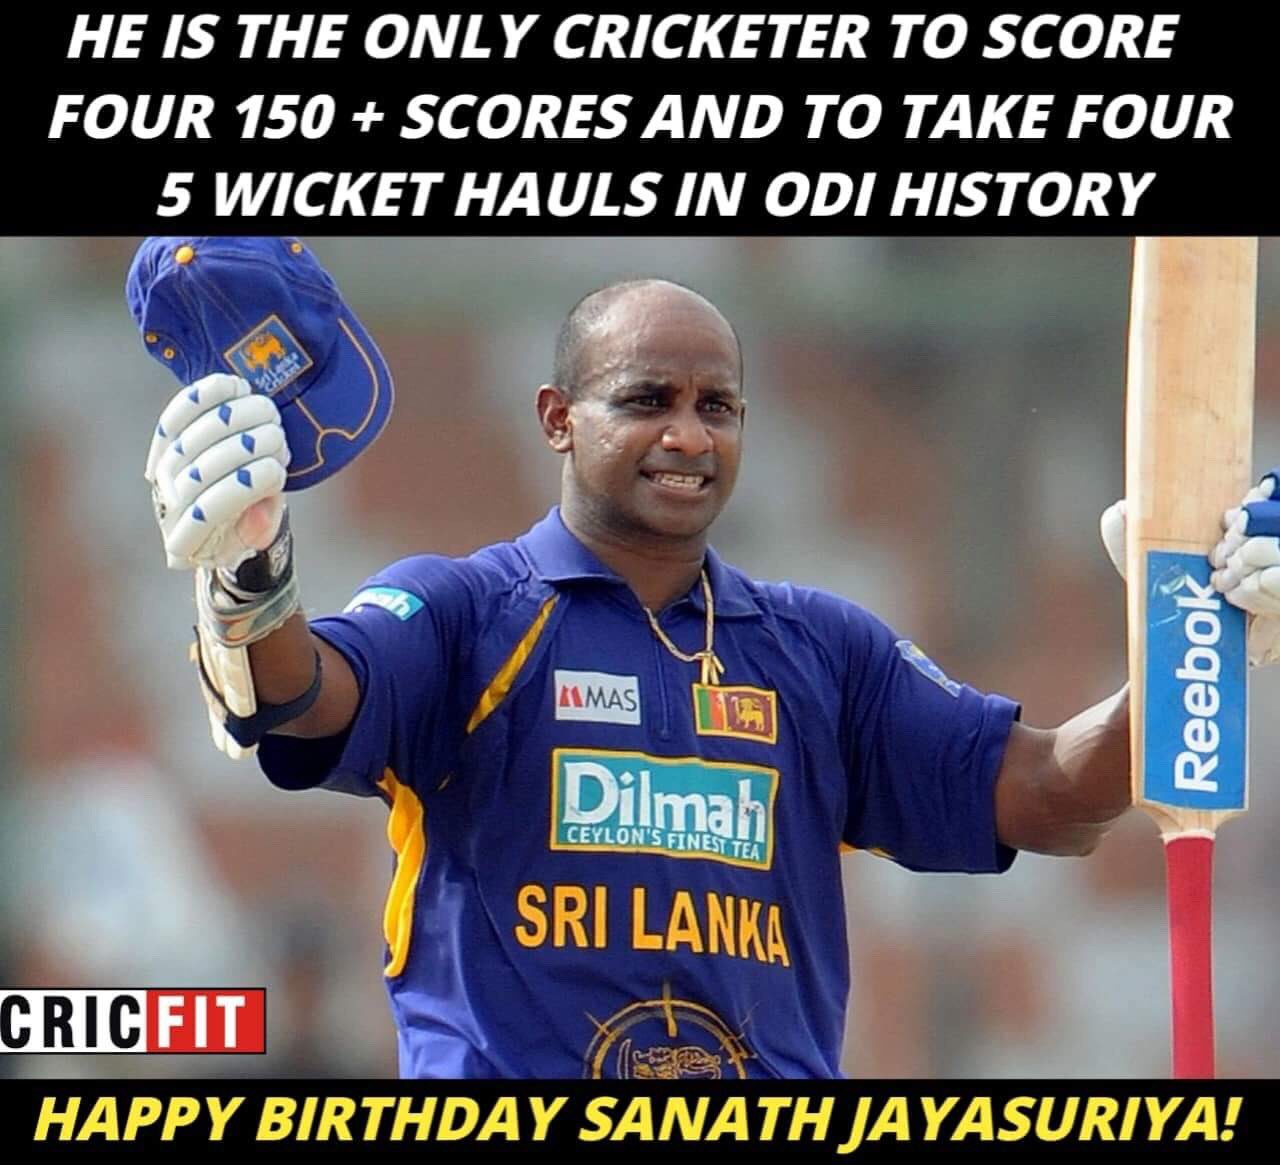 Happy Birthday Sanath Jayasuriya!